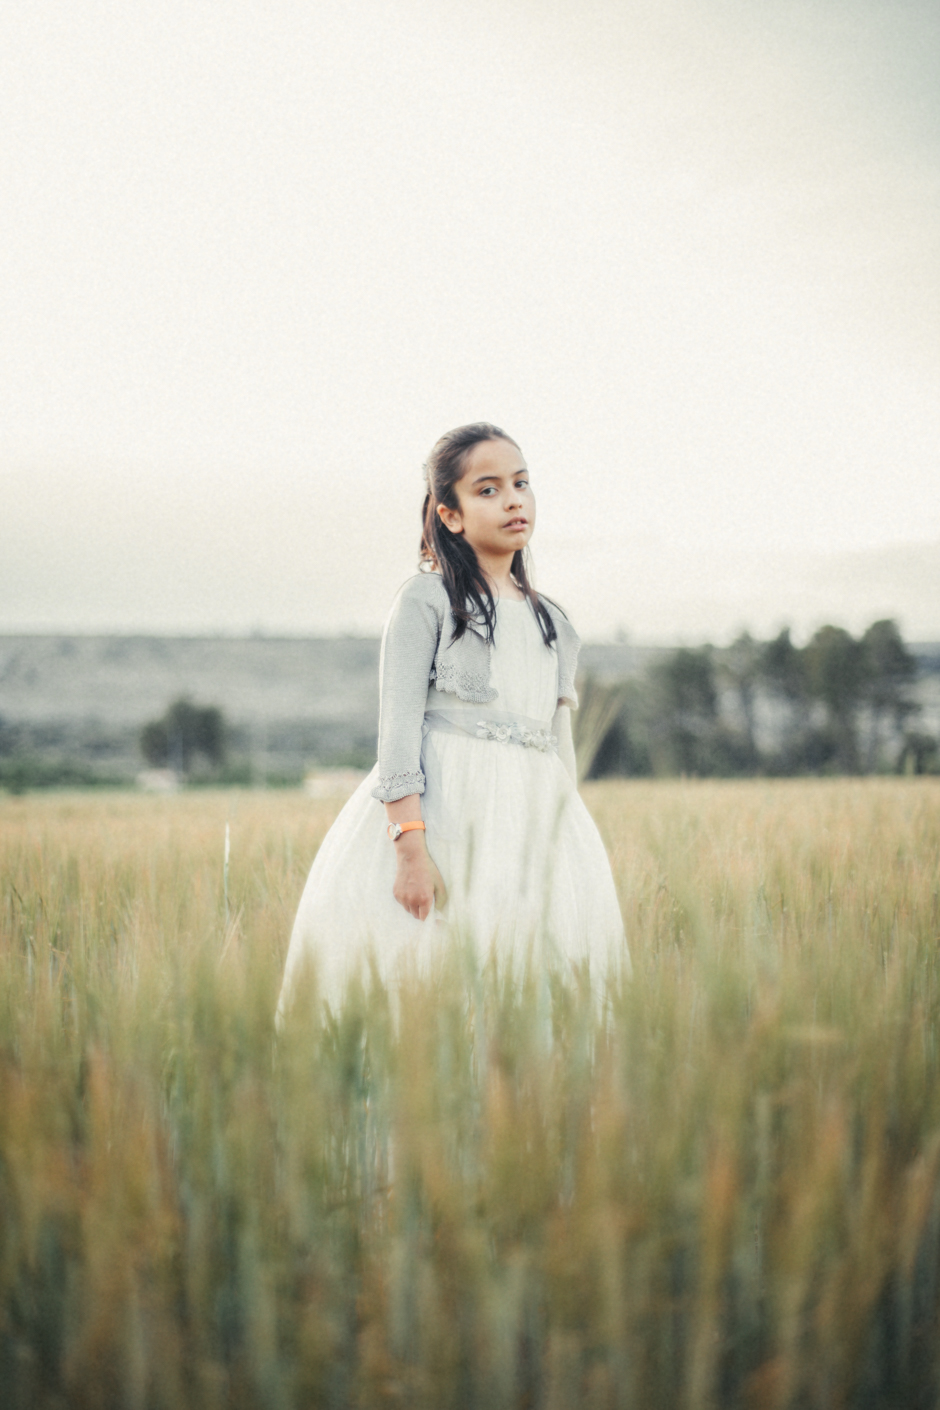 fotos-de-comuniones-alicante-y-valencia-bodafilms-jose-caballero-wedding-photographer-fotografo-de-bodas-en-valencia-y-mallorca-4.jpg